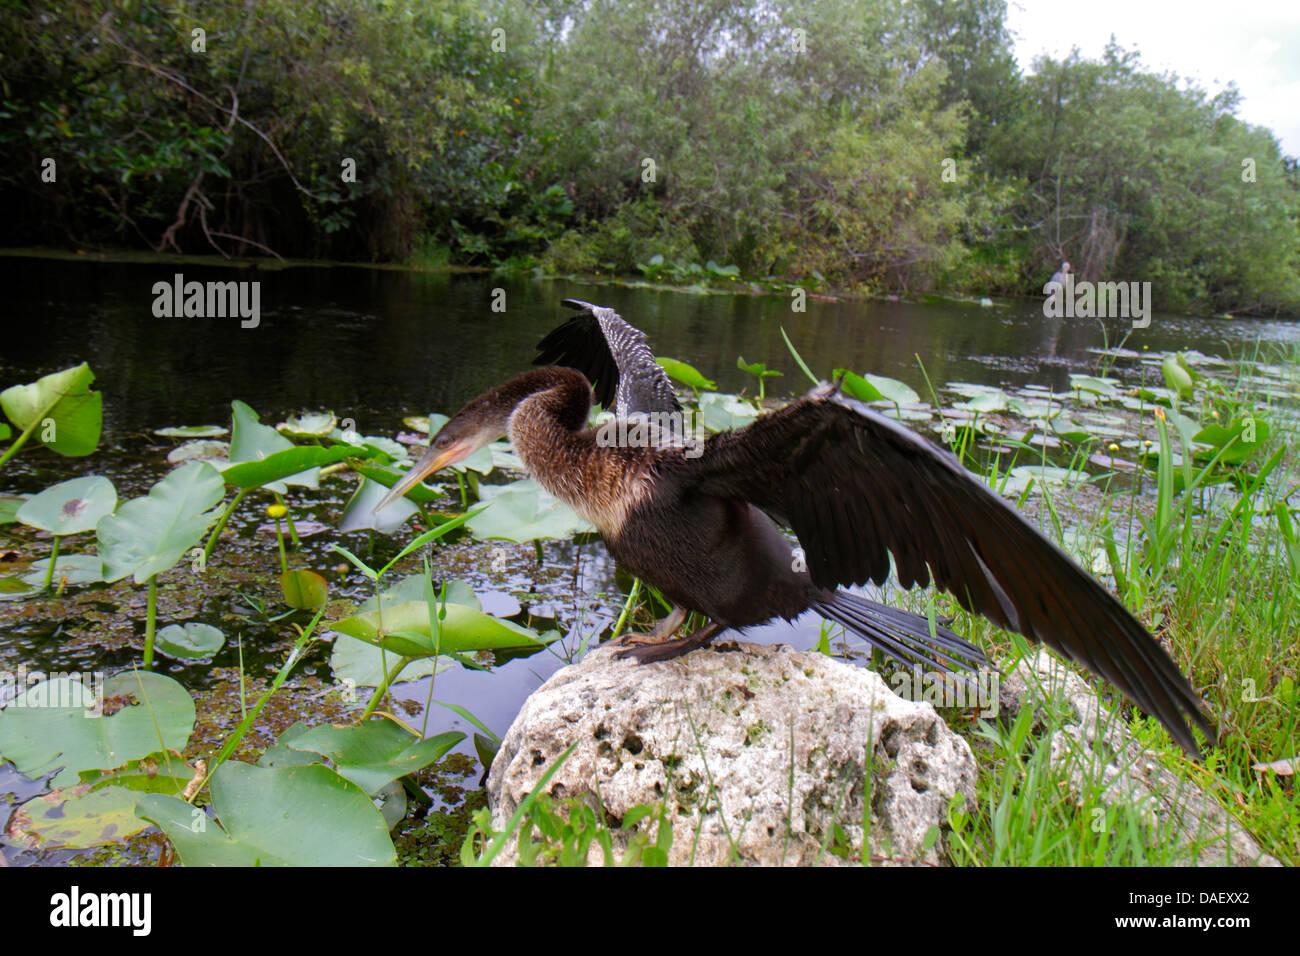 Miami Everglades Florida National Park Shark Valley Visitors Center centre Bike Tram Trail anhinga bird drying wings - Stock Image